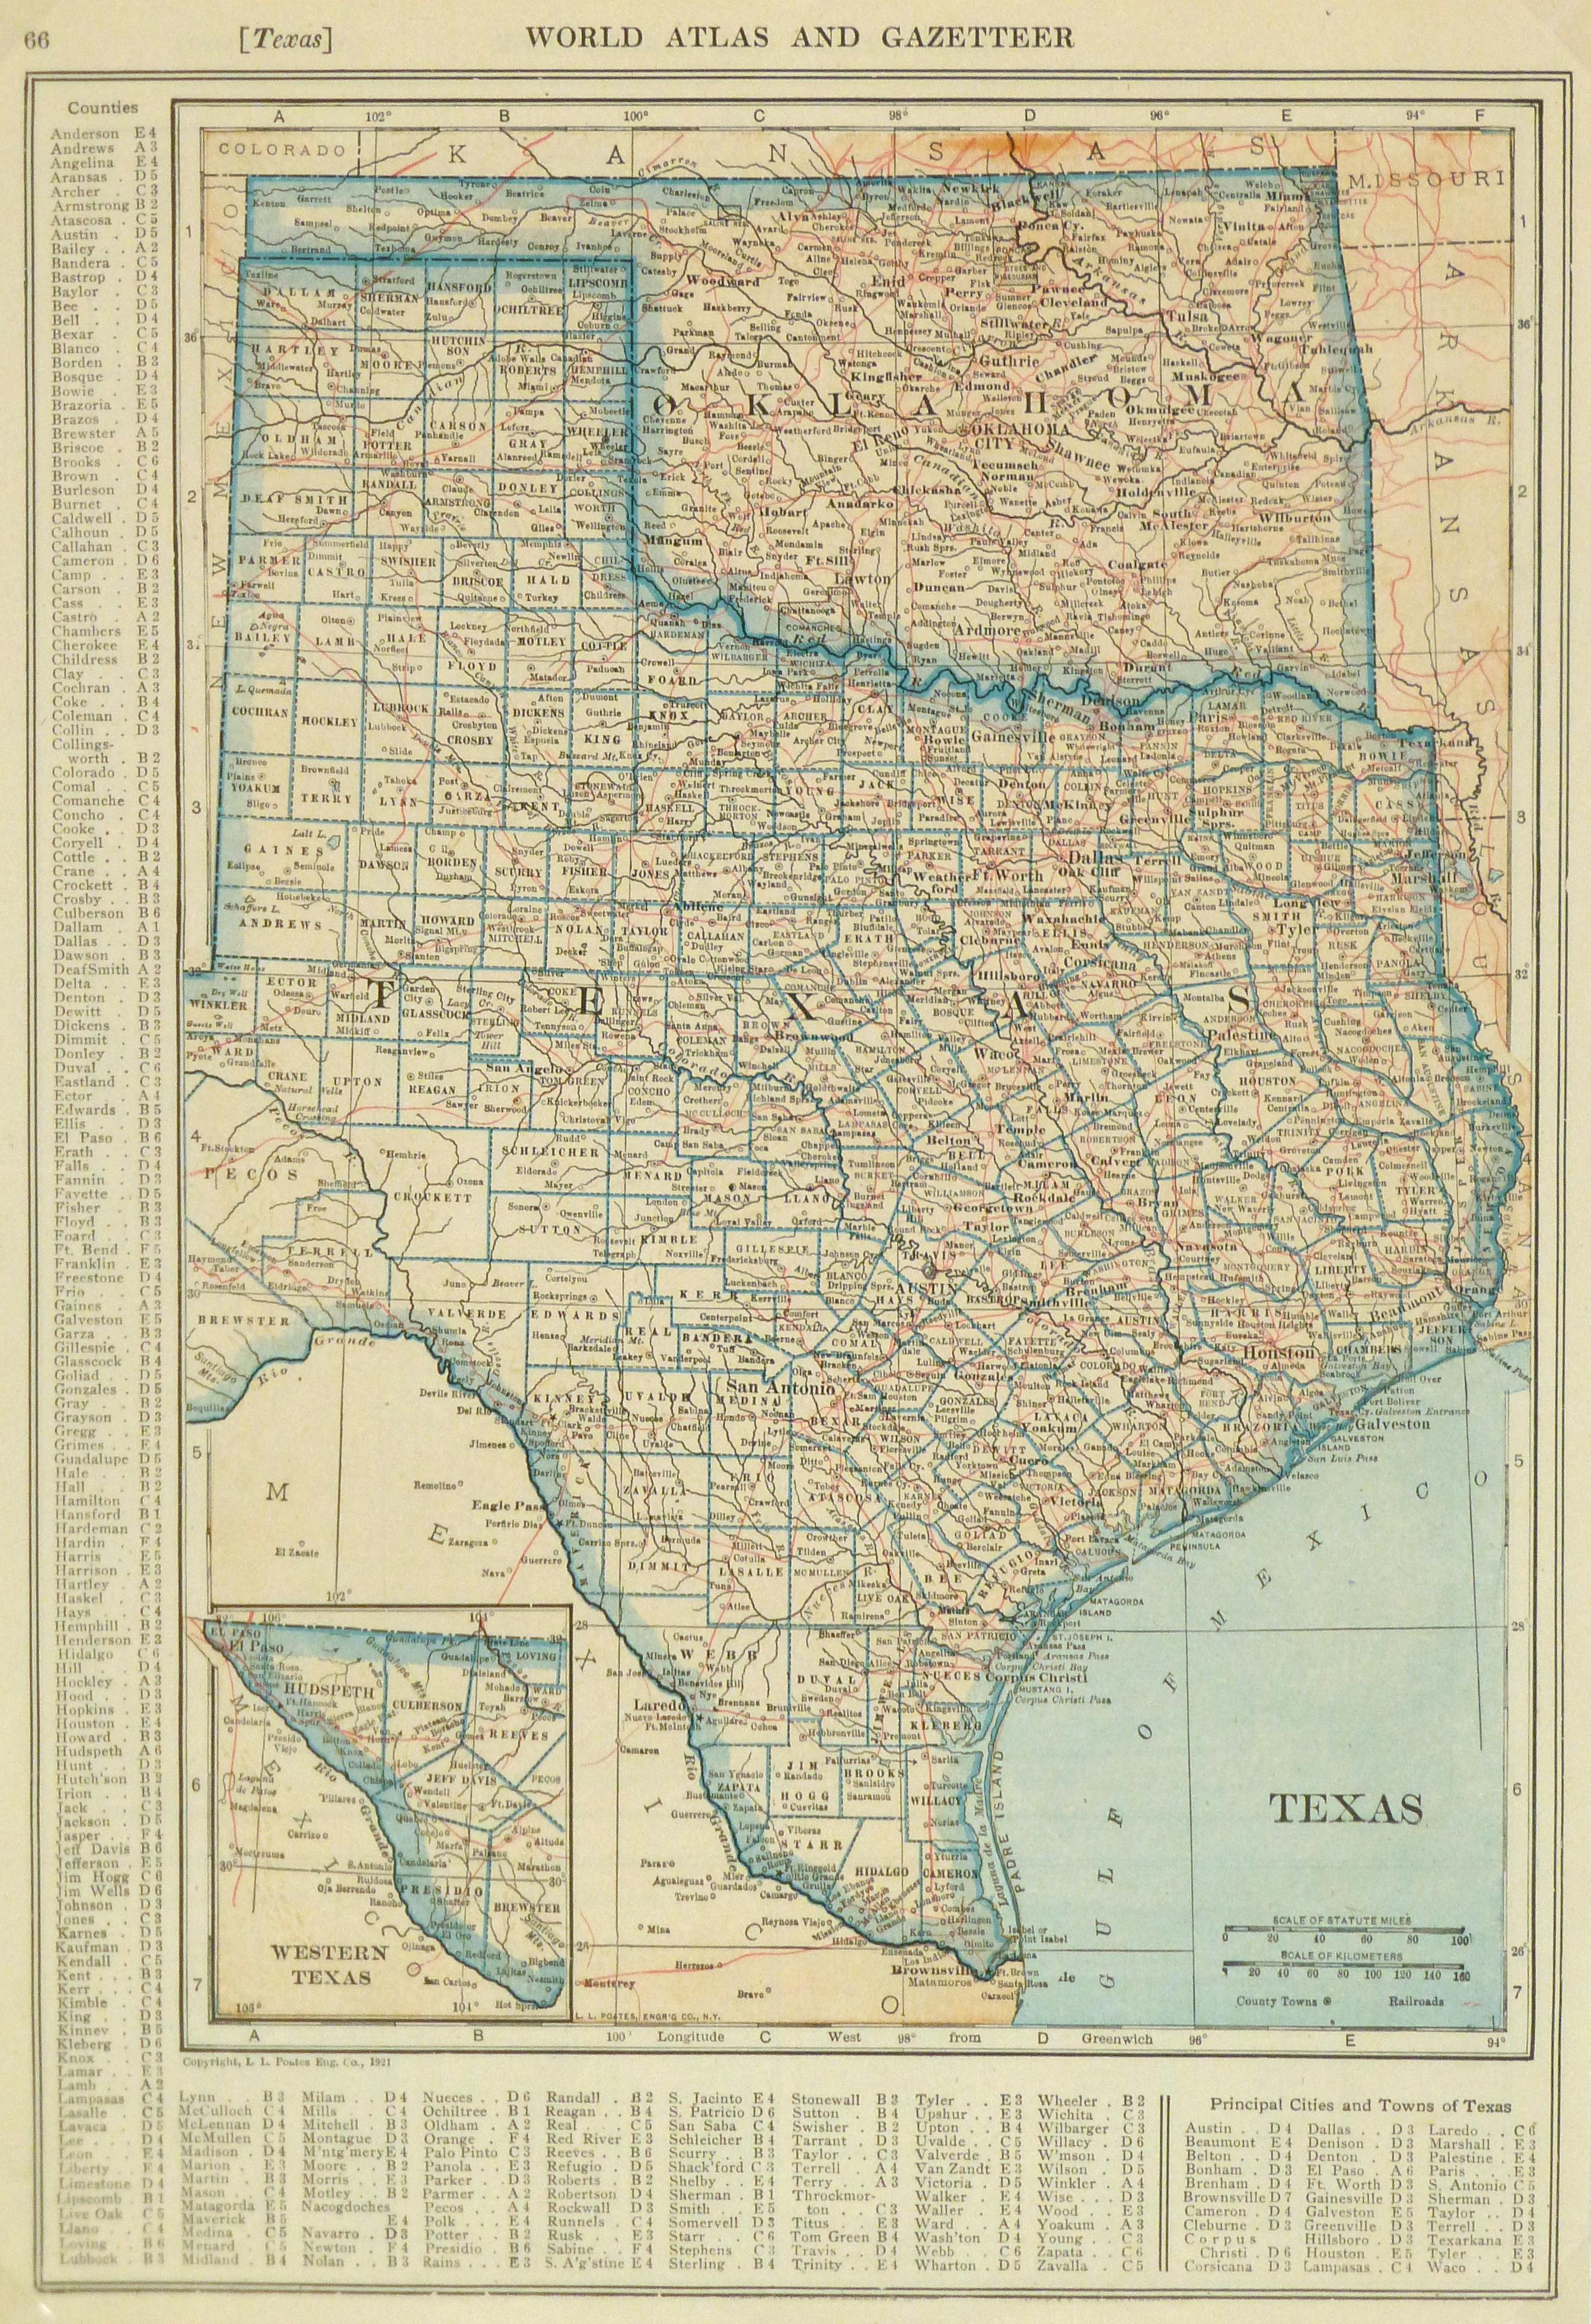 Texas & Oklahoma Map, 1921 - Original Art, Antique Maps & Prints - Vintage Texas Map Prints